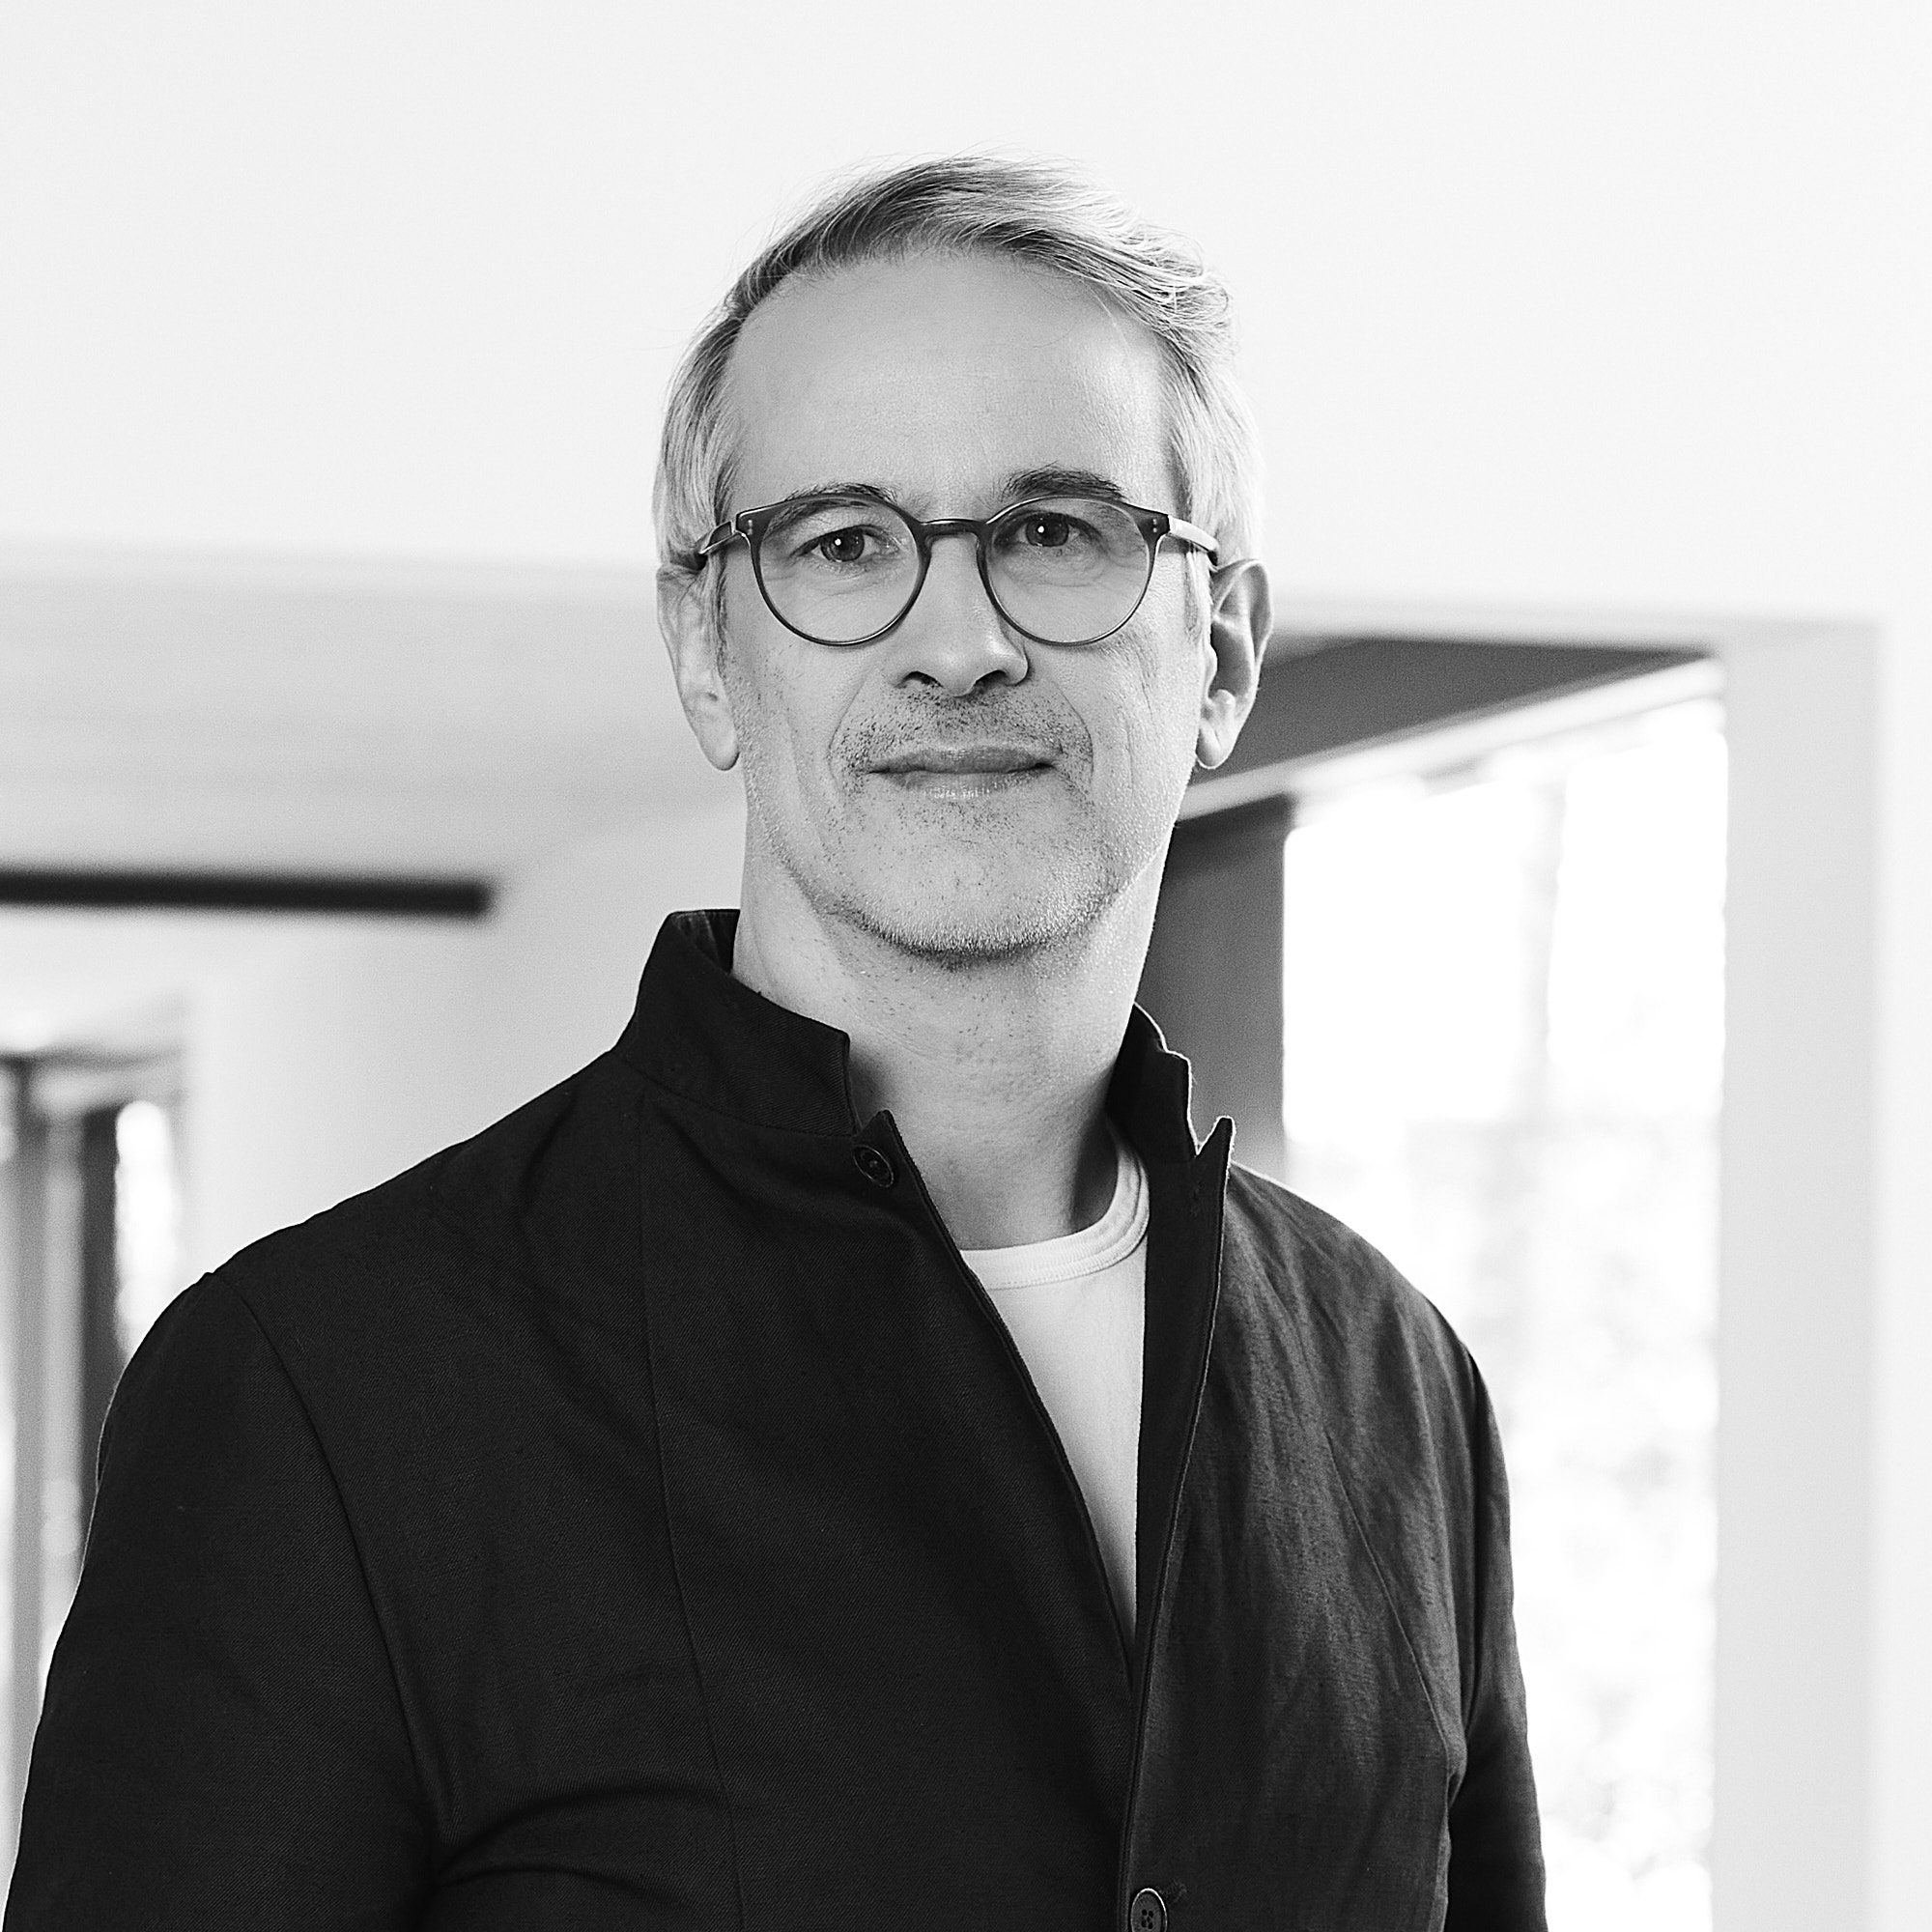 Jens Kapitzky